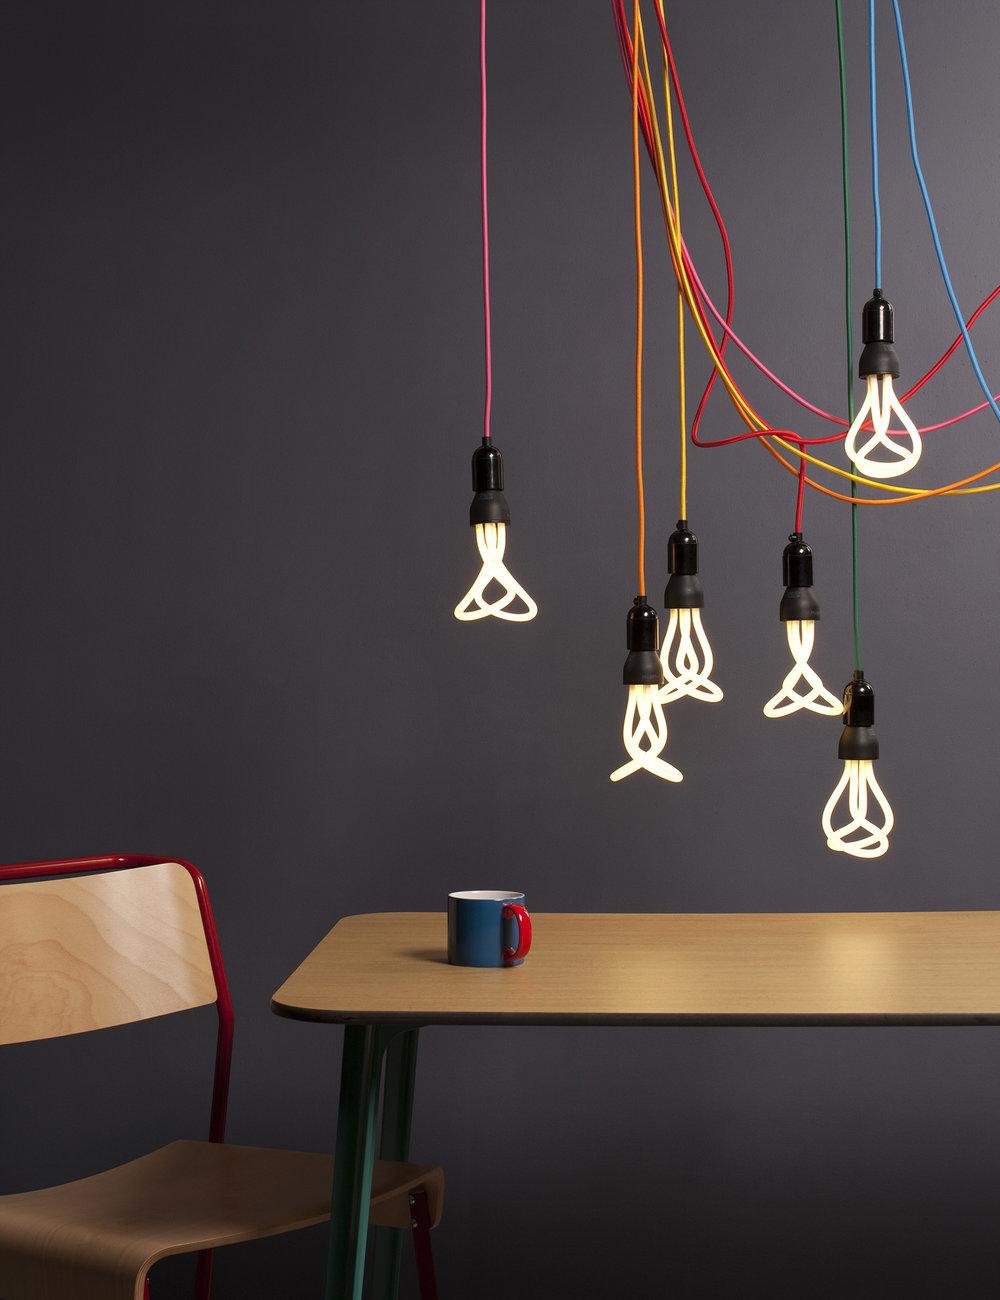 Plumen-001-Decorative-Light-Bulbs.jpg